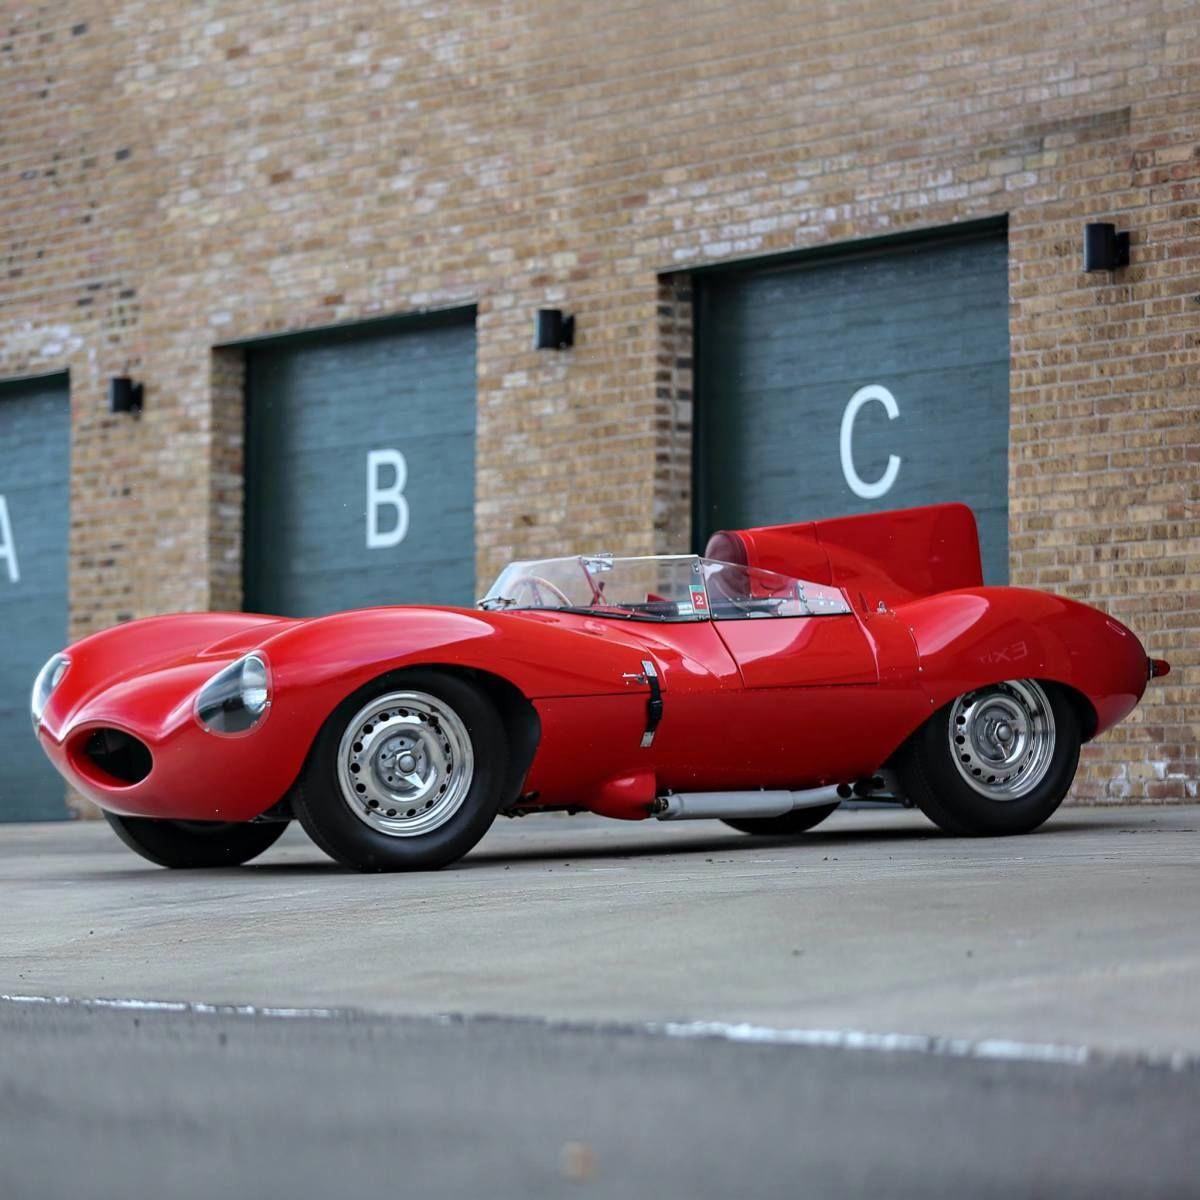 Clarkes Jaguar Xjs Specialist Classic Cars